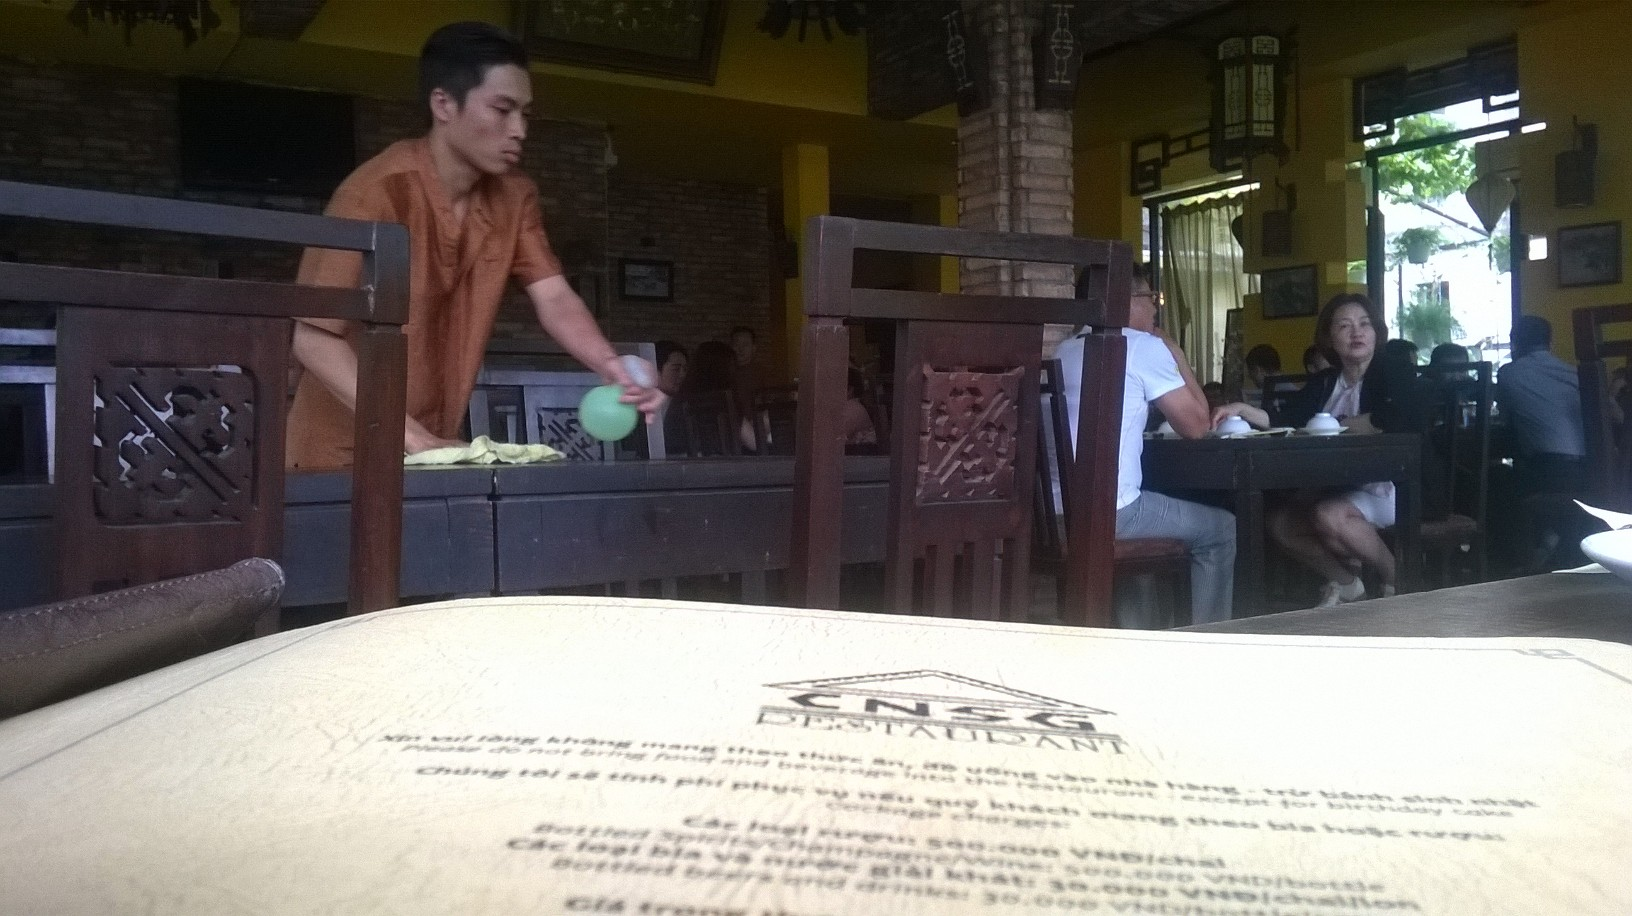 hcmc-com-nieu-sai-gon-resto-tables-mar16